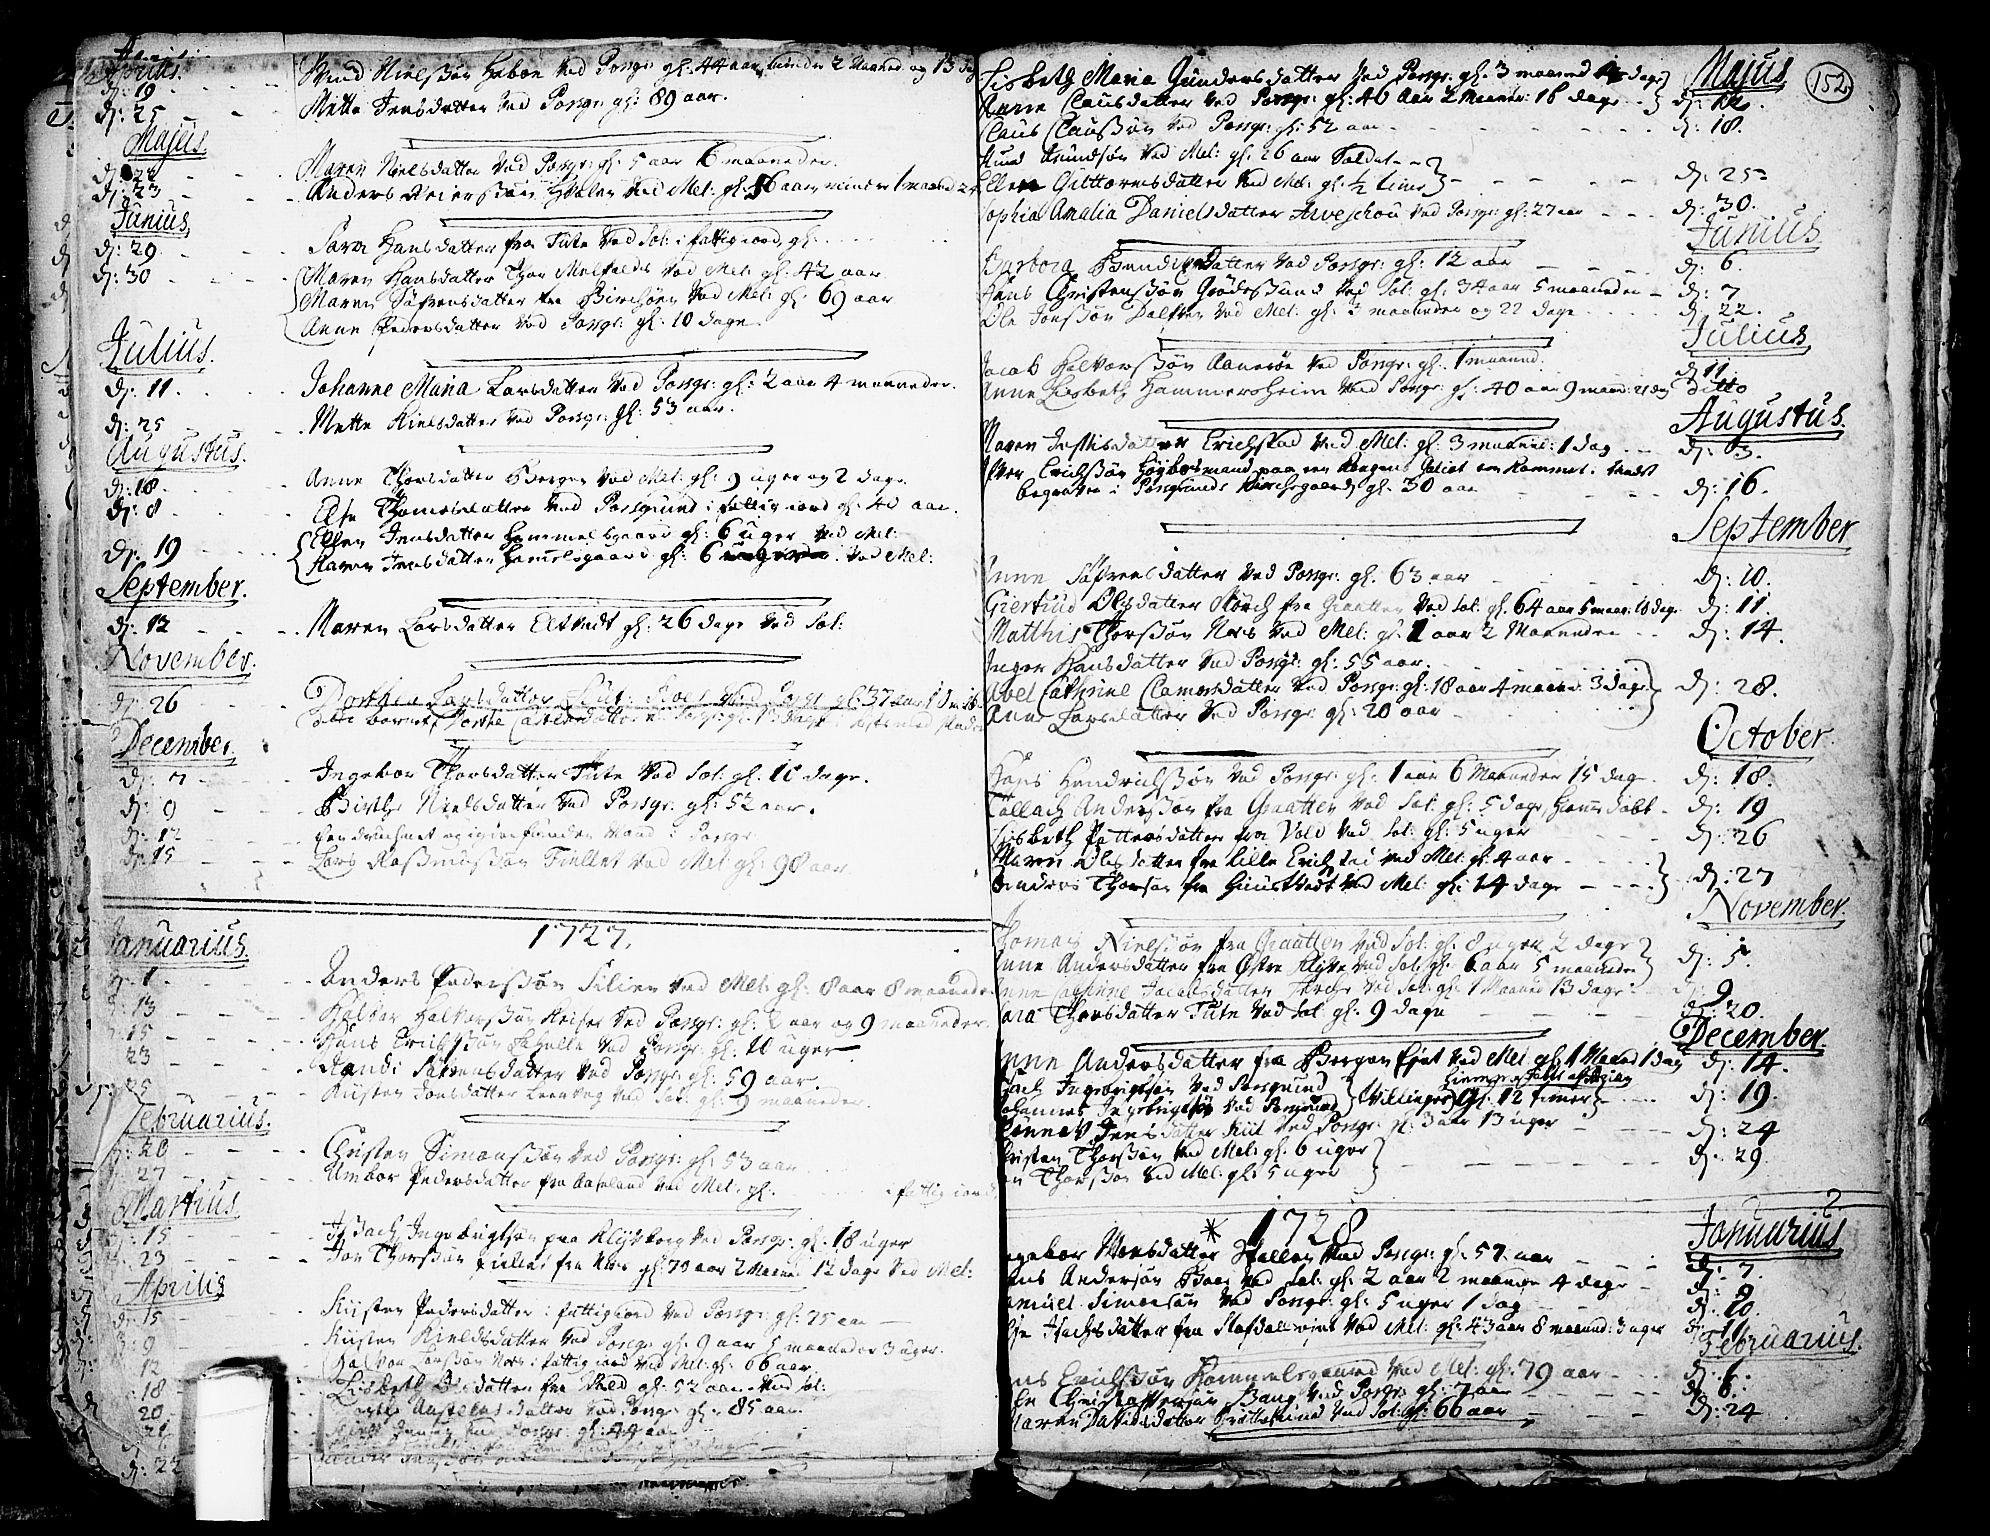 SAKO, Solum kirkebøker, F/Fa/L0002: Ministerialbok nr. I 2, 1713-1761, s. 152